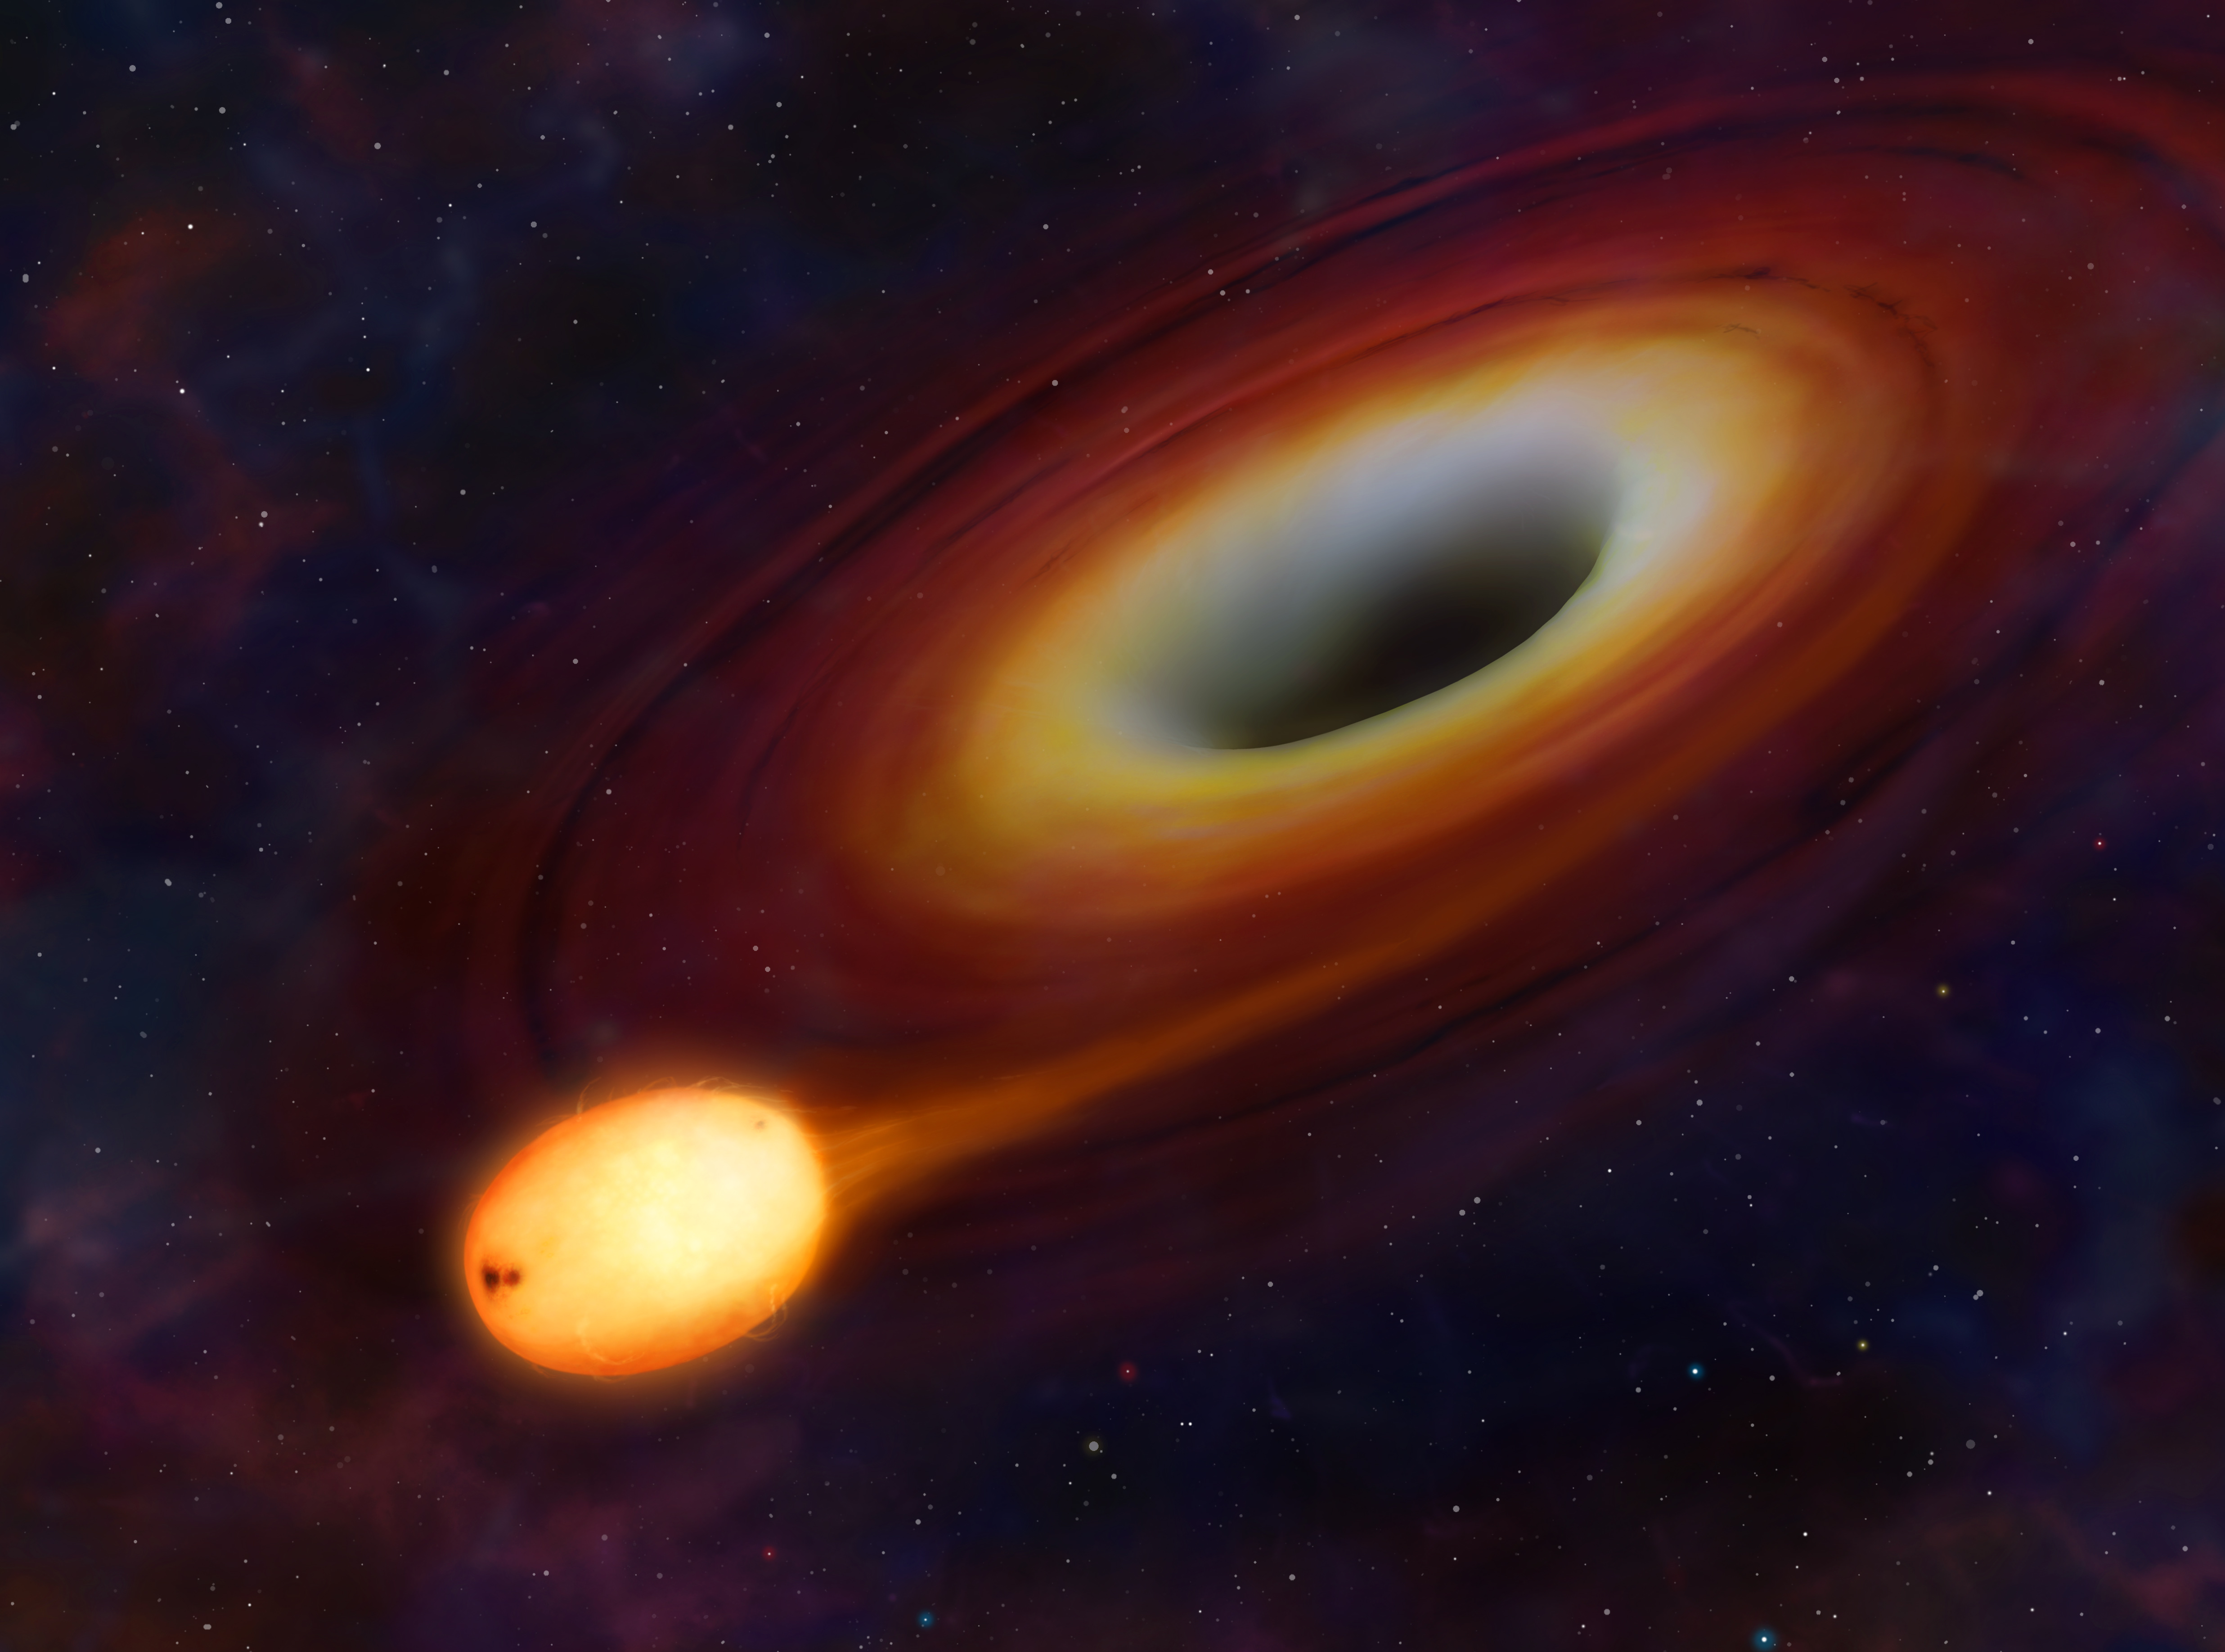 Black Hole 4k Ultra Hd Wallpaper Background Image